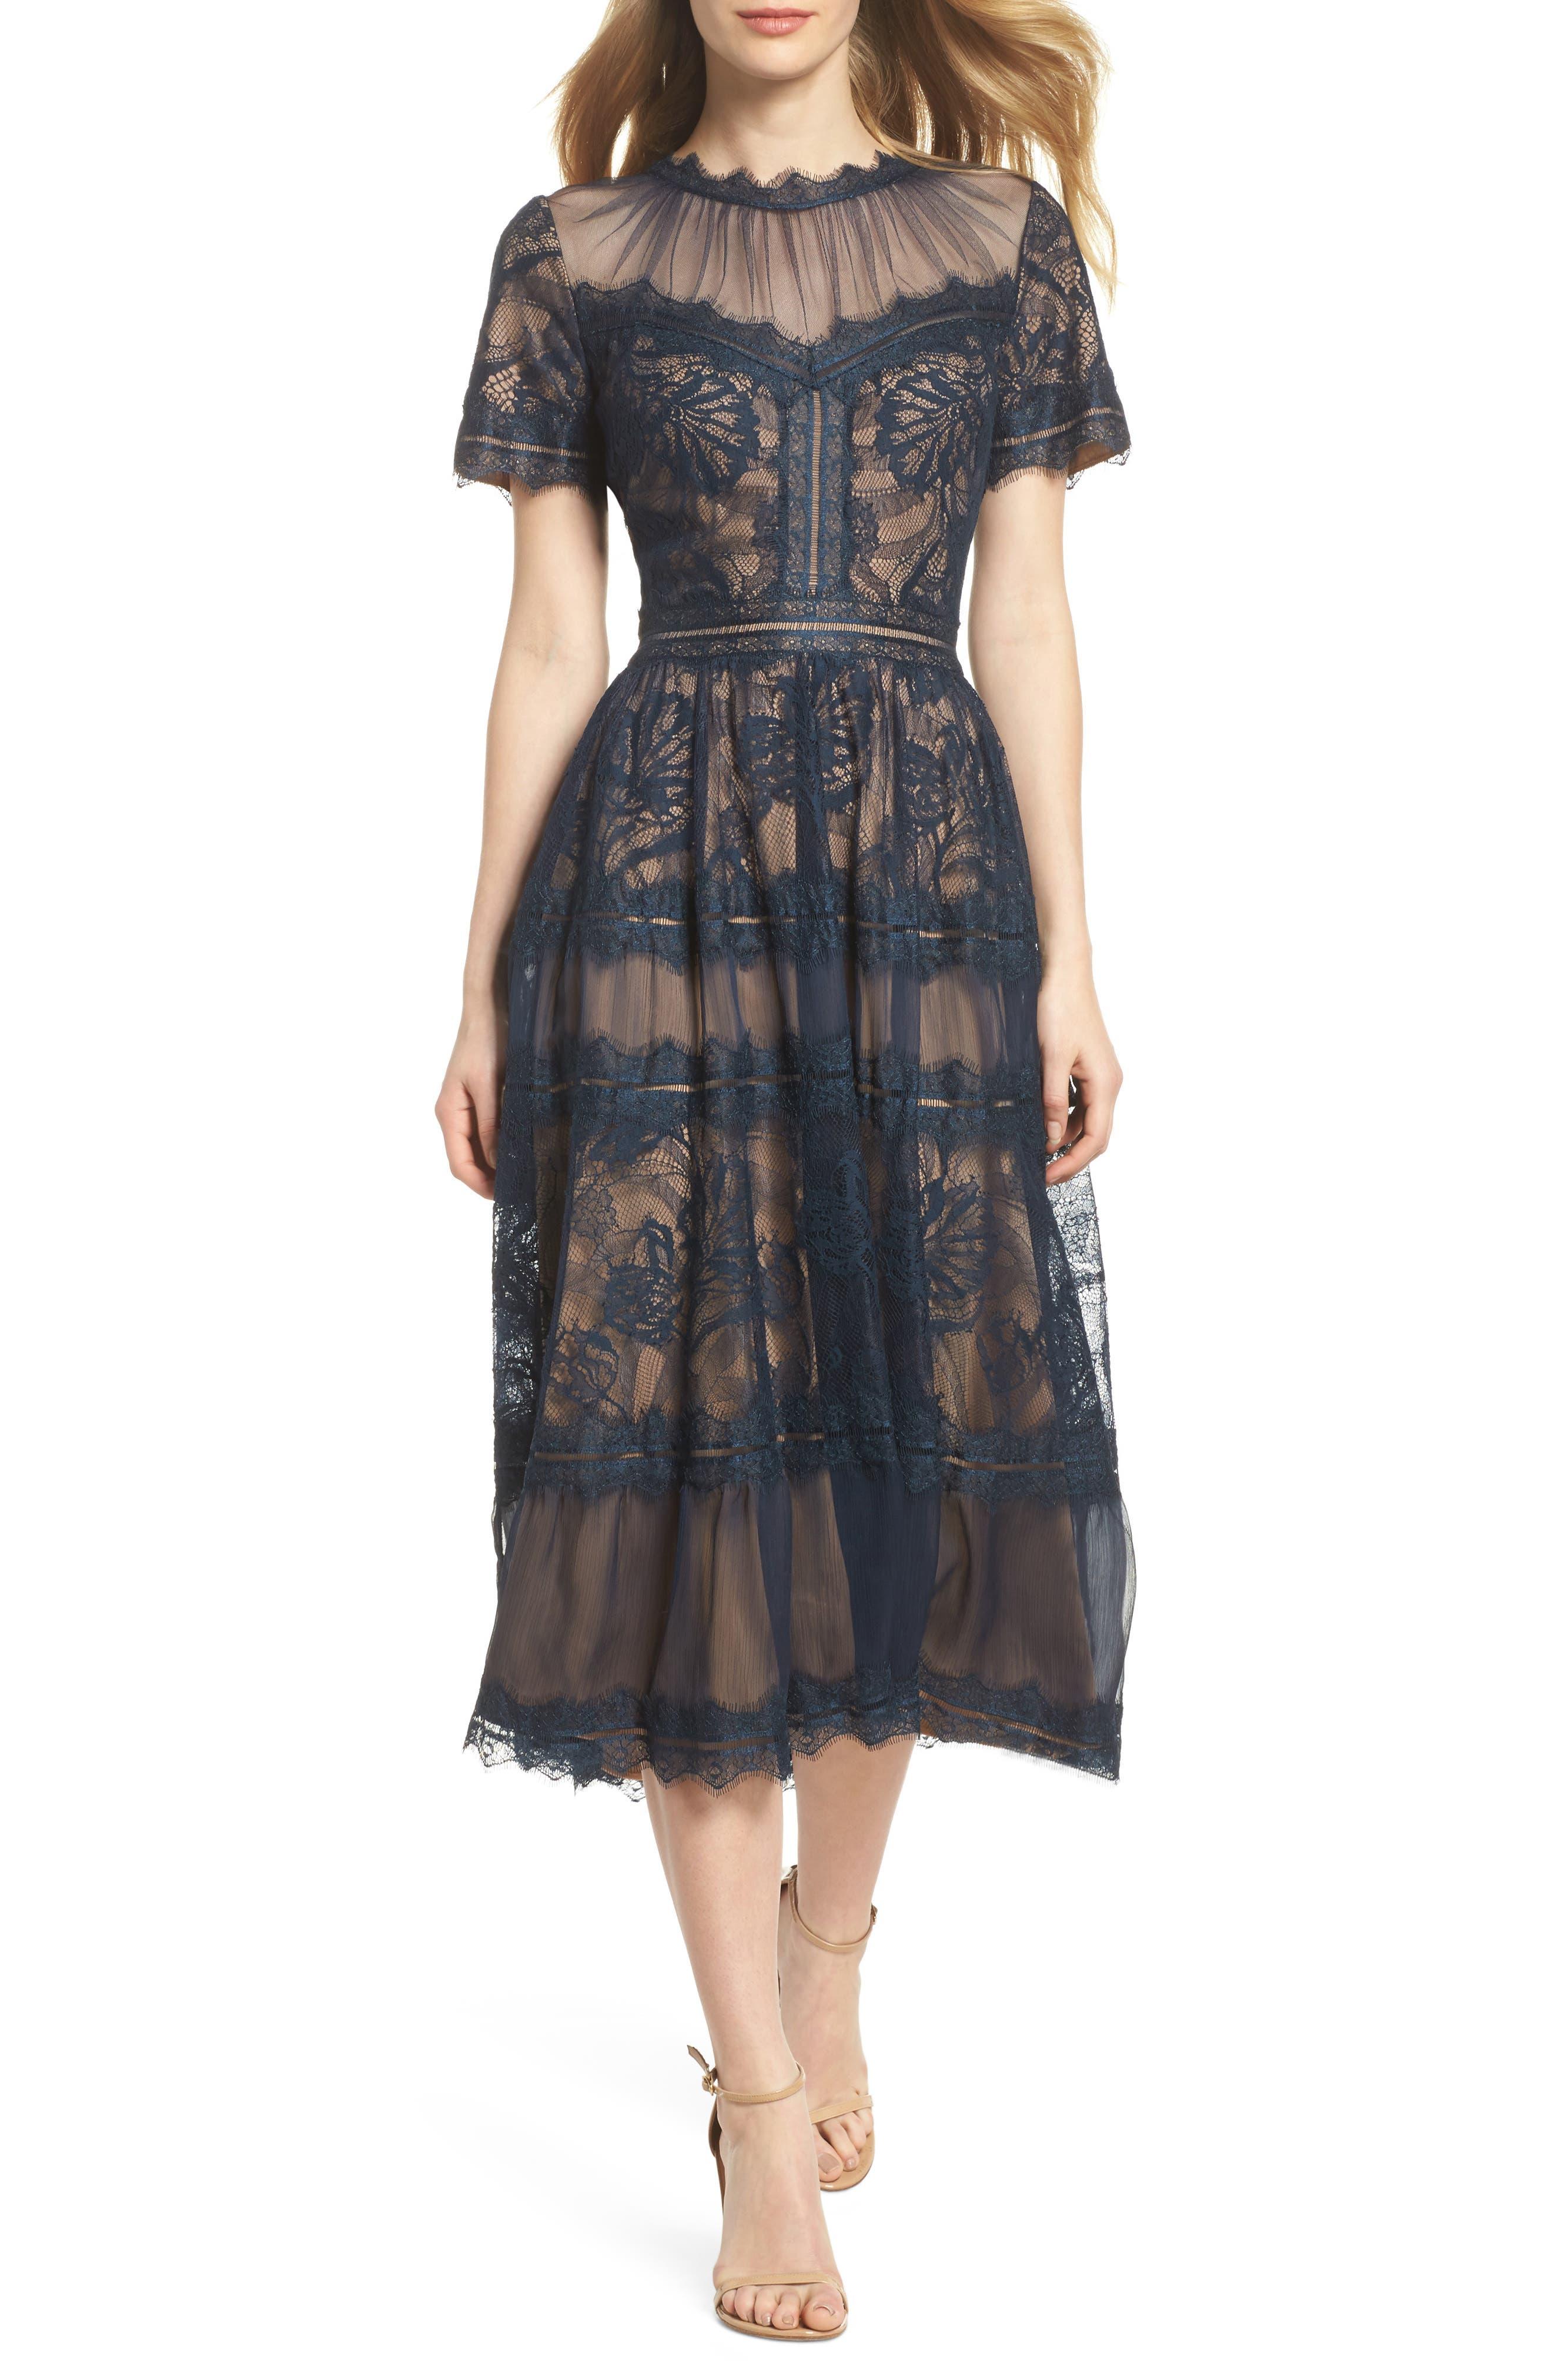 TADASHI SHOJI, Lace Midi Dress, Main thumbnail 1, color, NAVY/ NUDE